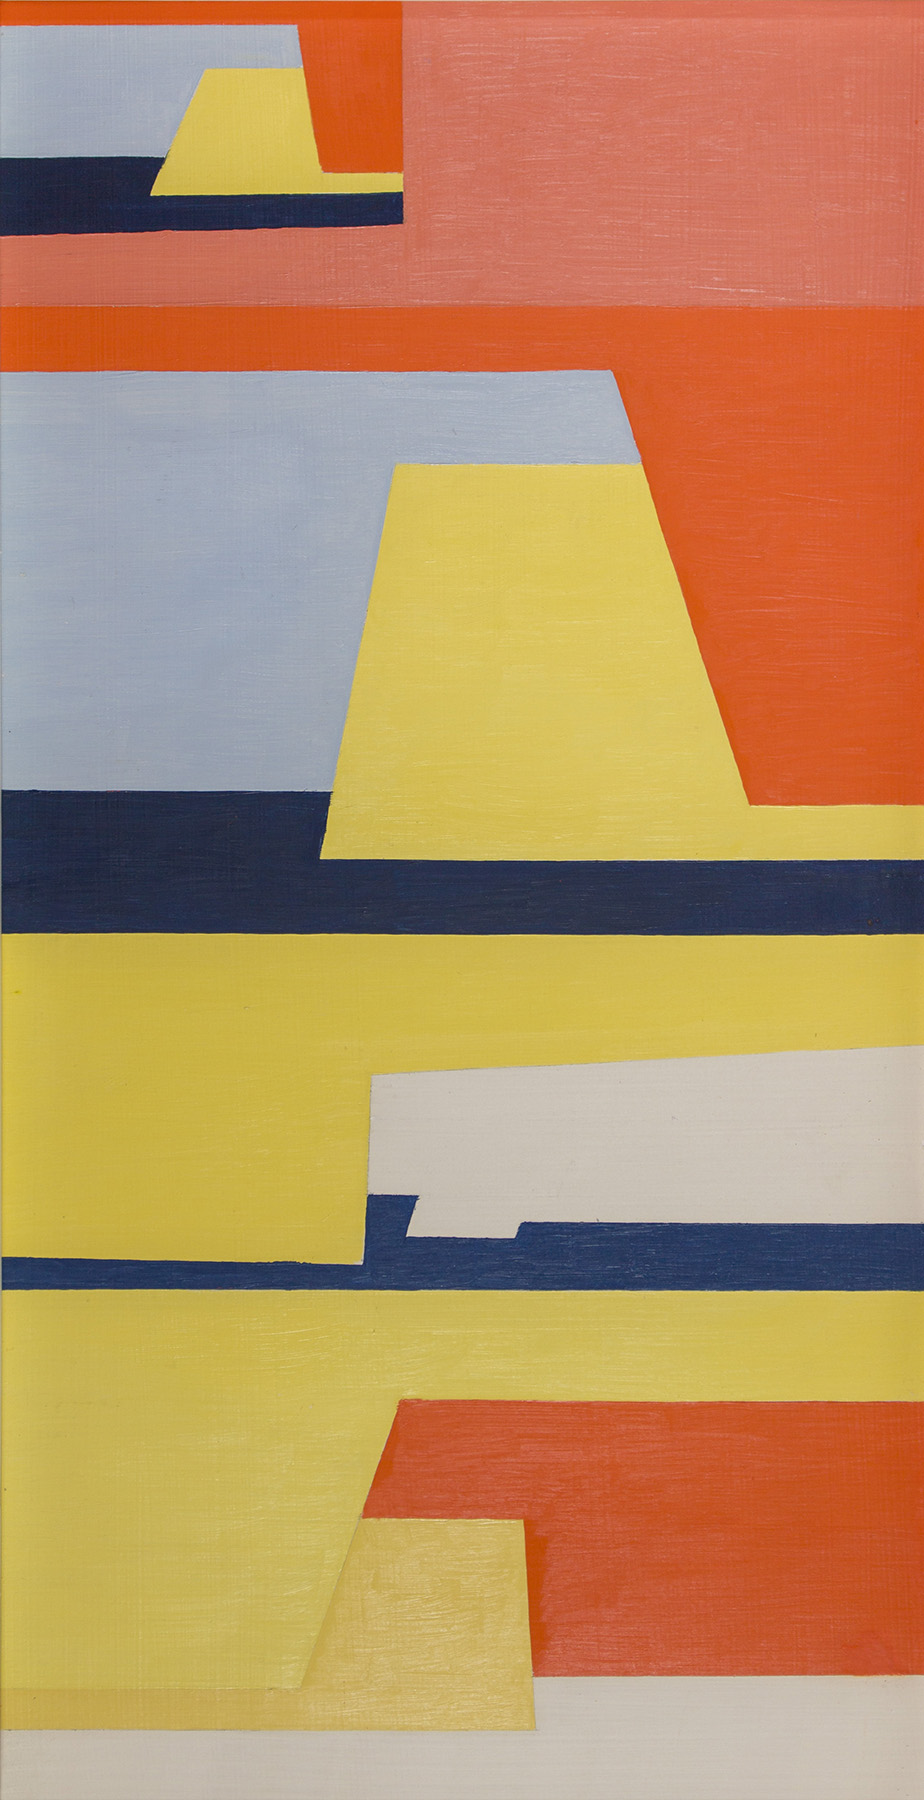 Christian Roeckenschuss   K516, 66 x 35 cm, um 1956, Holz farbig gefasst